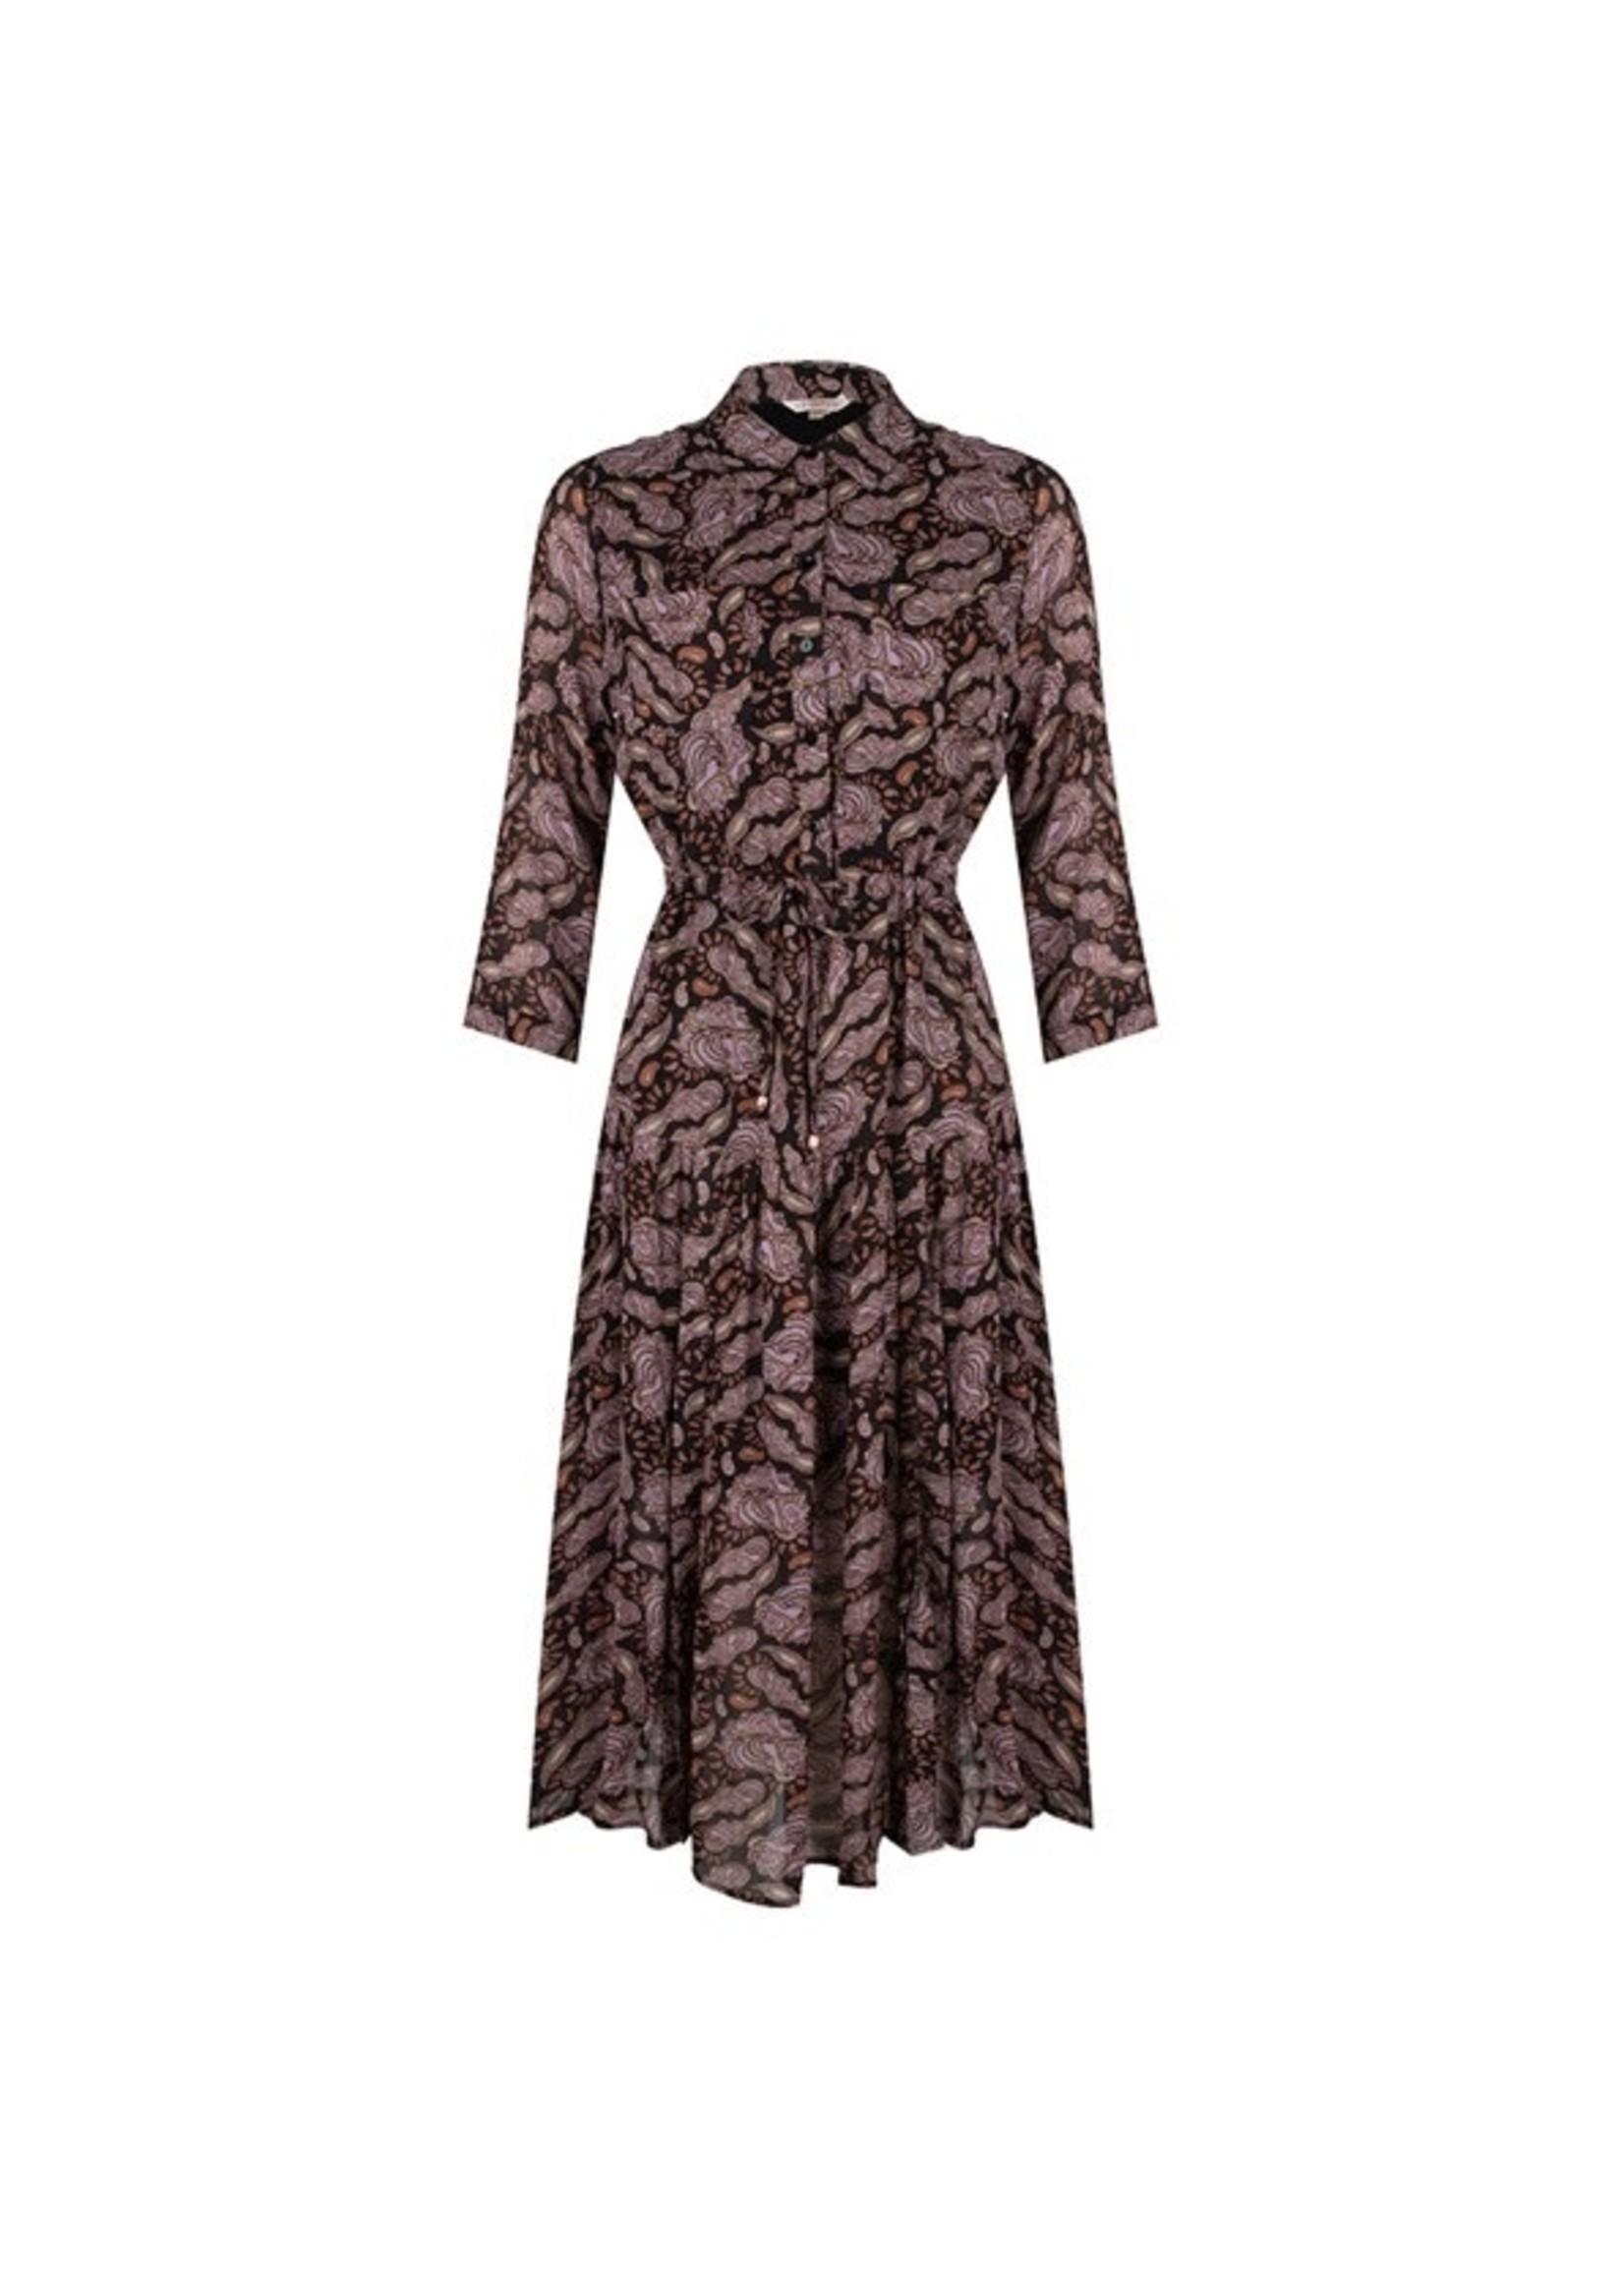 Esqualo Dress midi Purple paisley